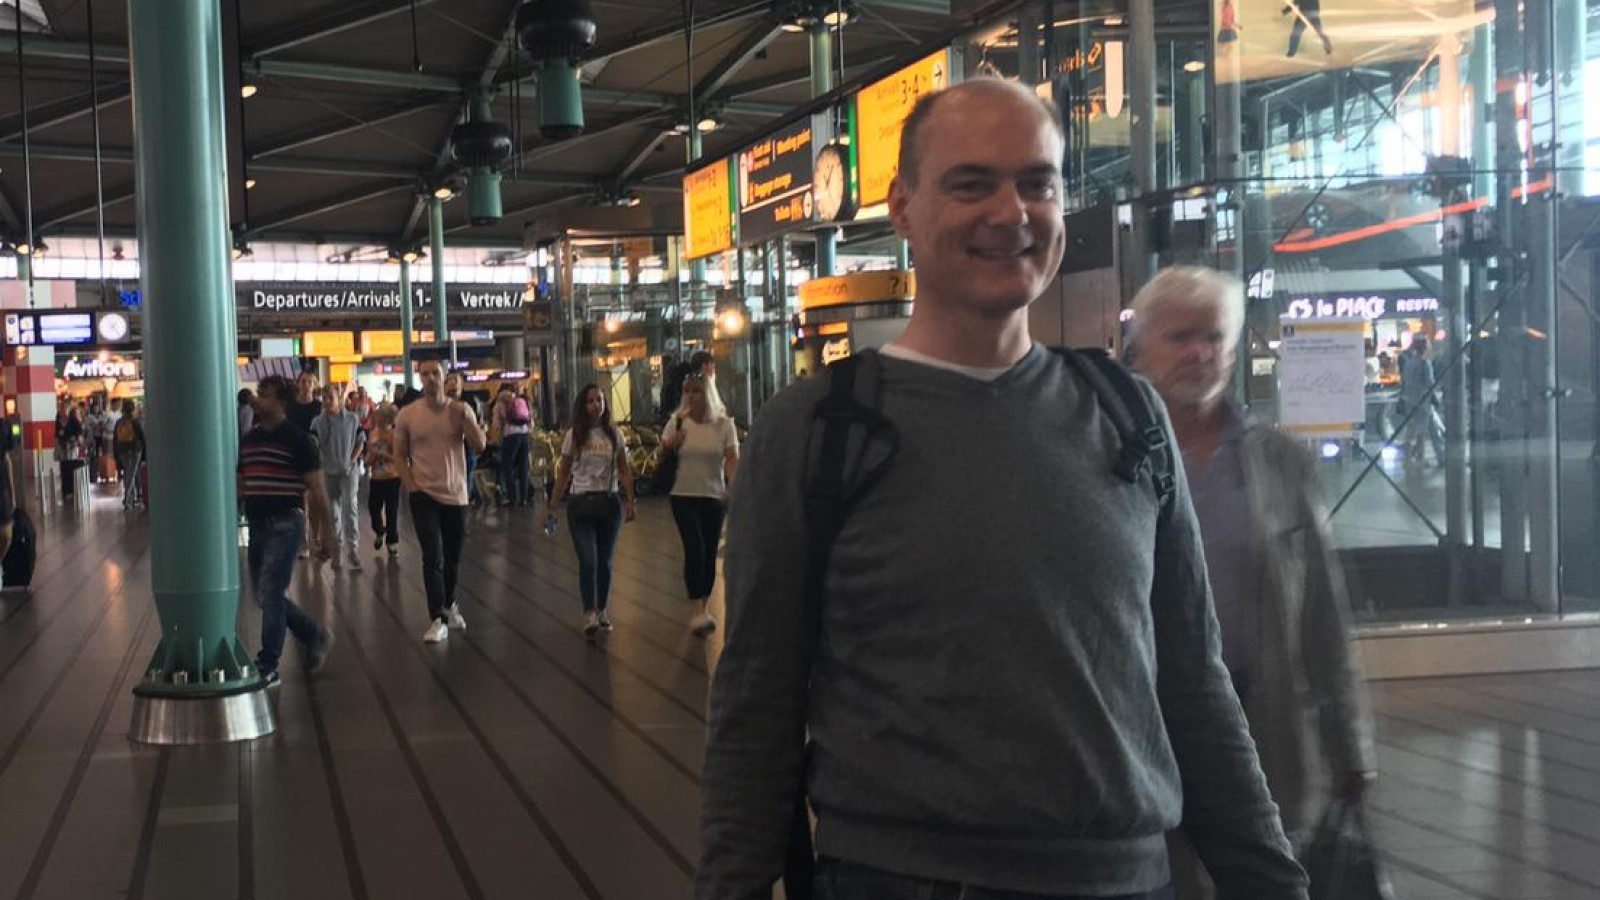 Grote zorgen om vermissing Weesper Pieter Houtekamer (47)